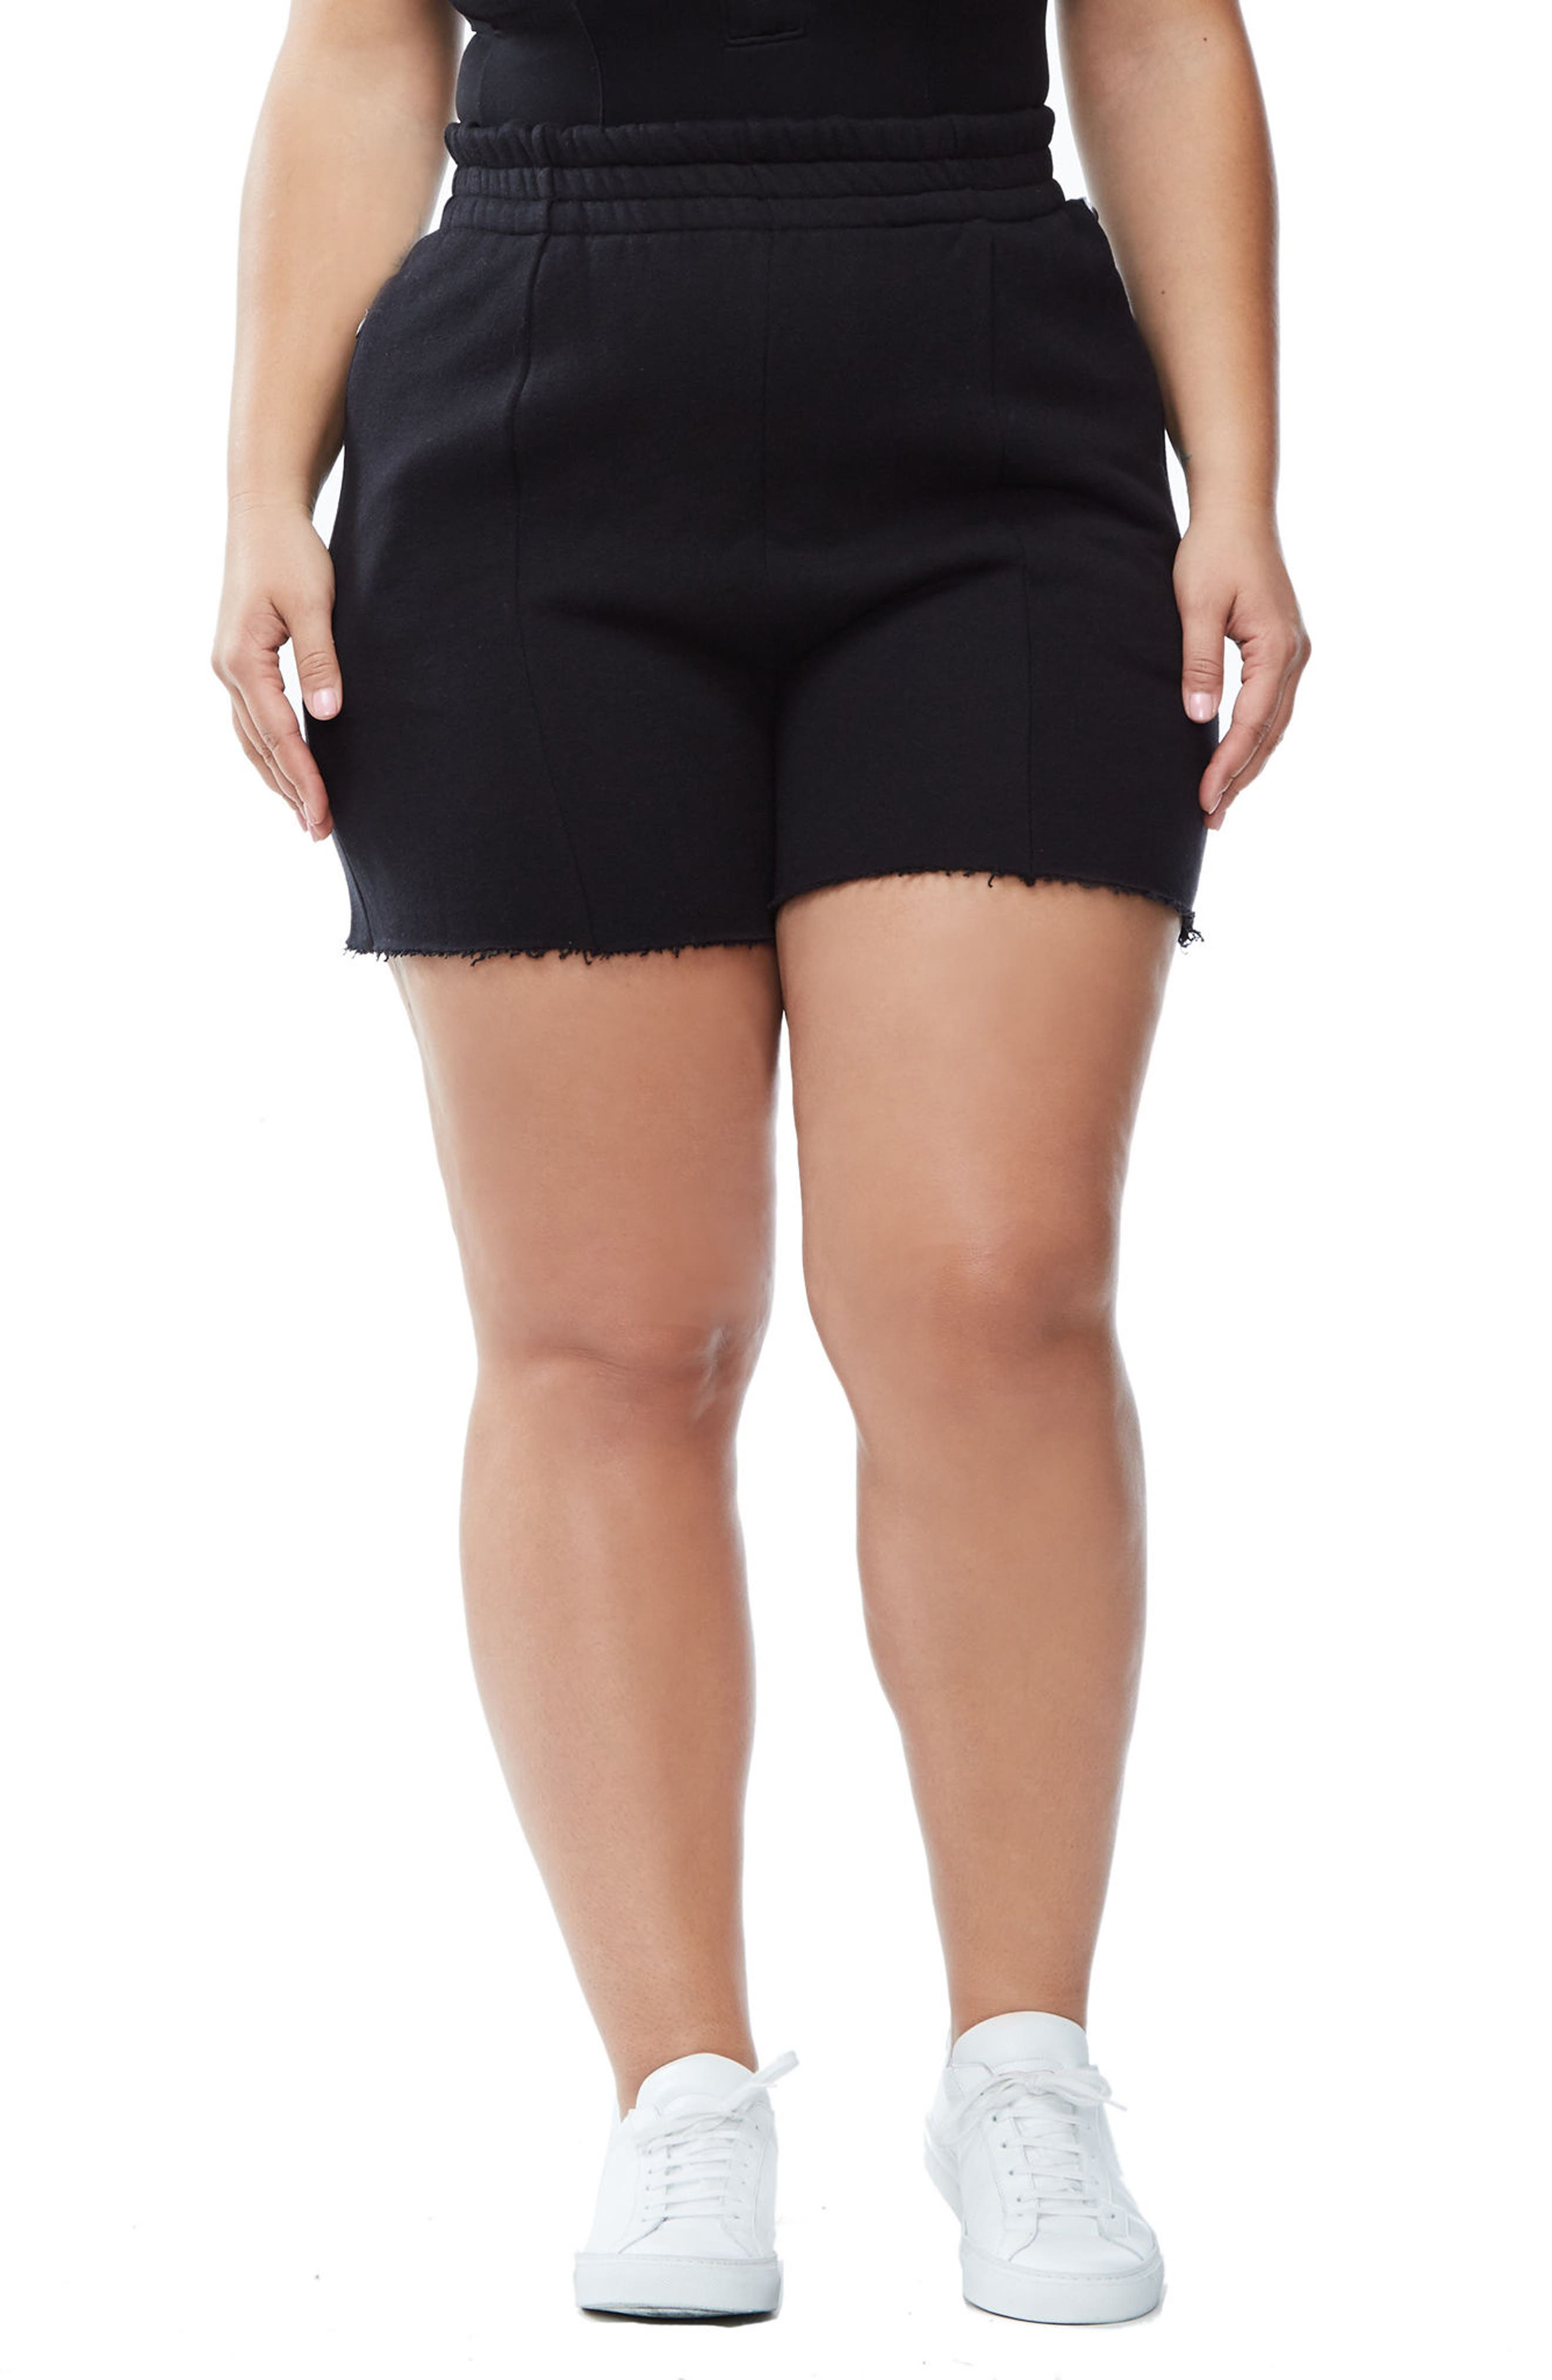 Good Sweats The High Waist Shorts,                             Main thumbnail 1, color,                             002